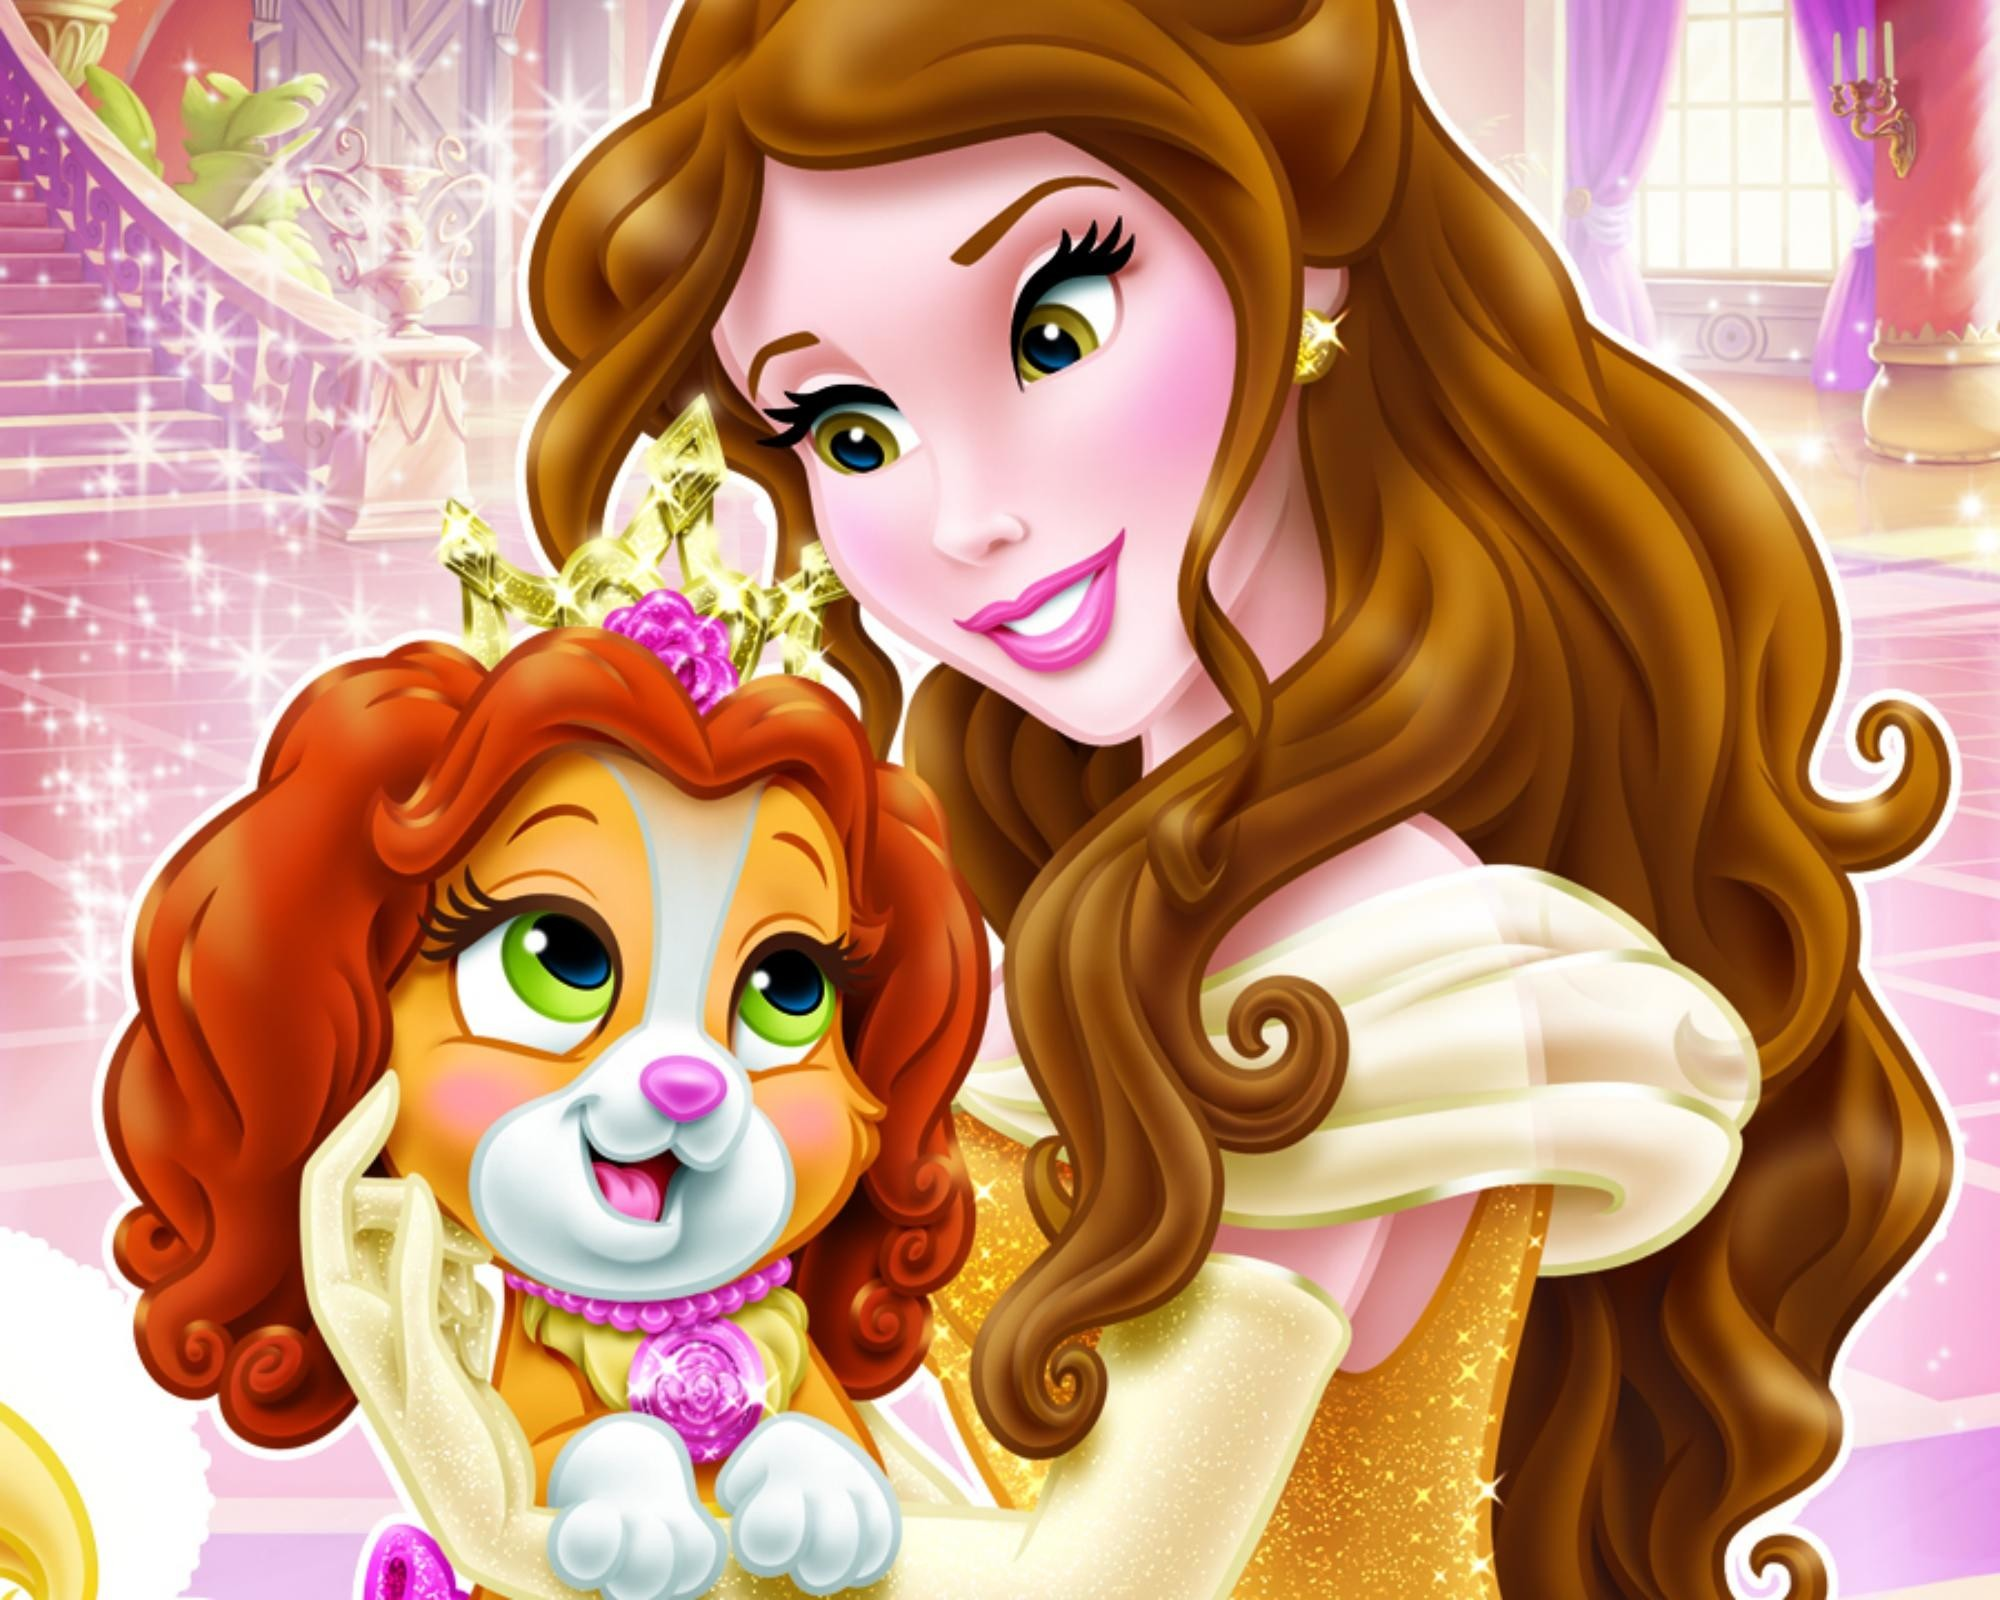 Res: 2000x1600, Teacup & Belle Disney Wallpaper